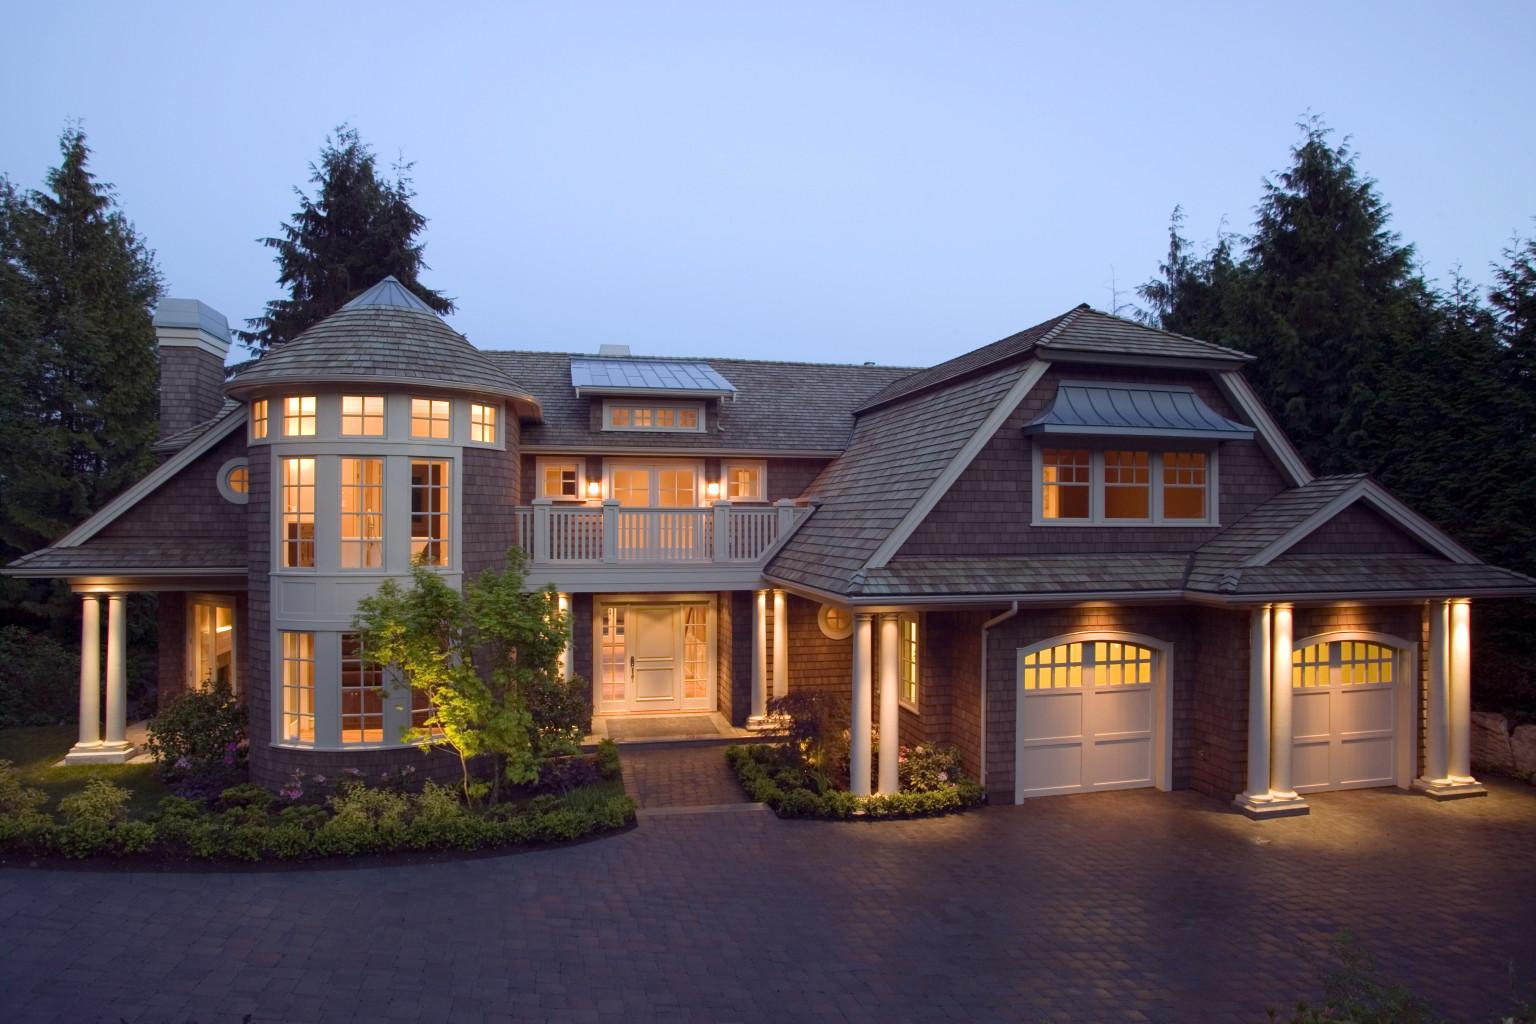 Vancouver 39 s million dollar real estate divide for Million dollar homes for sale in california